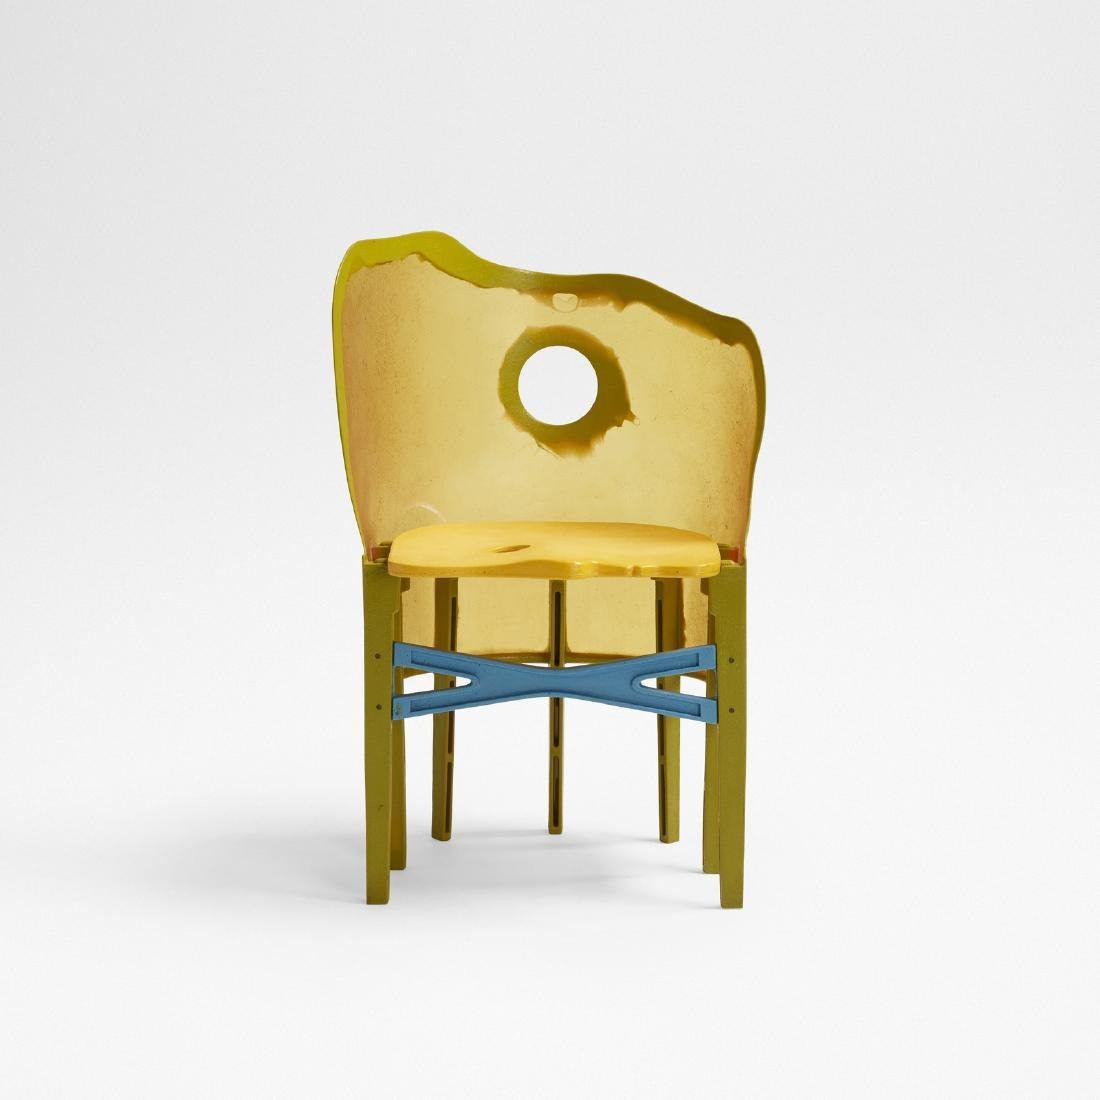 Gaetano Pesce, Open Sky Crosby chair - 2